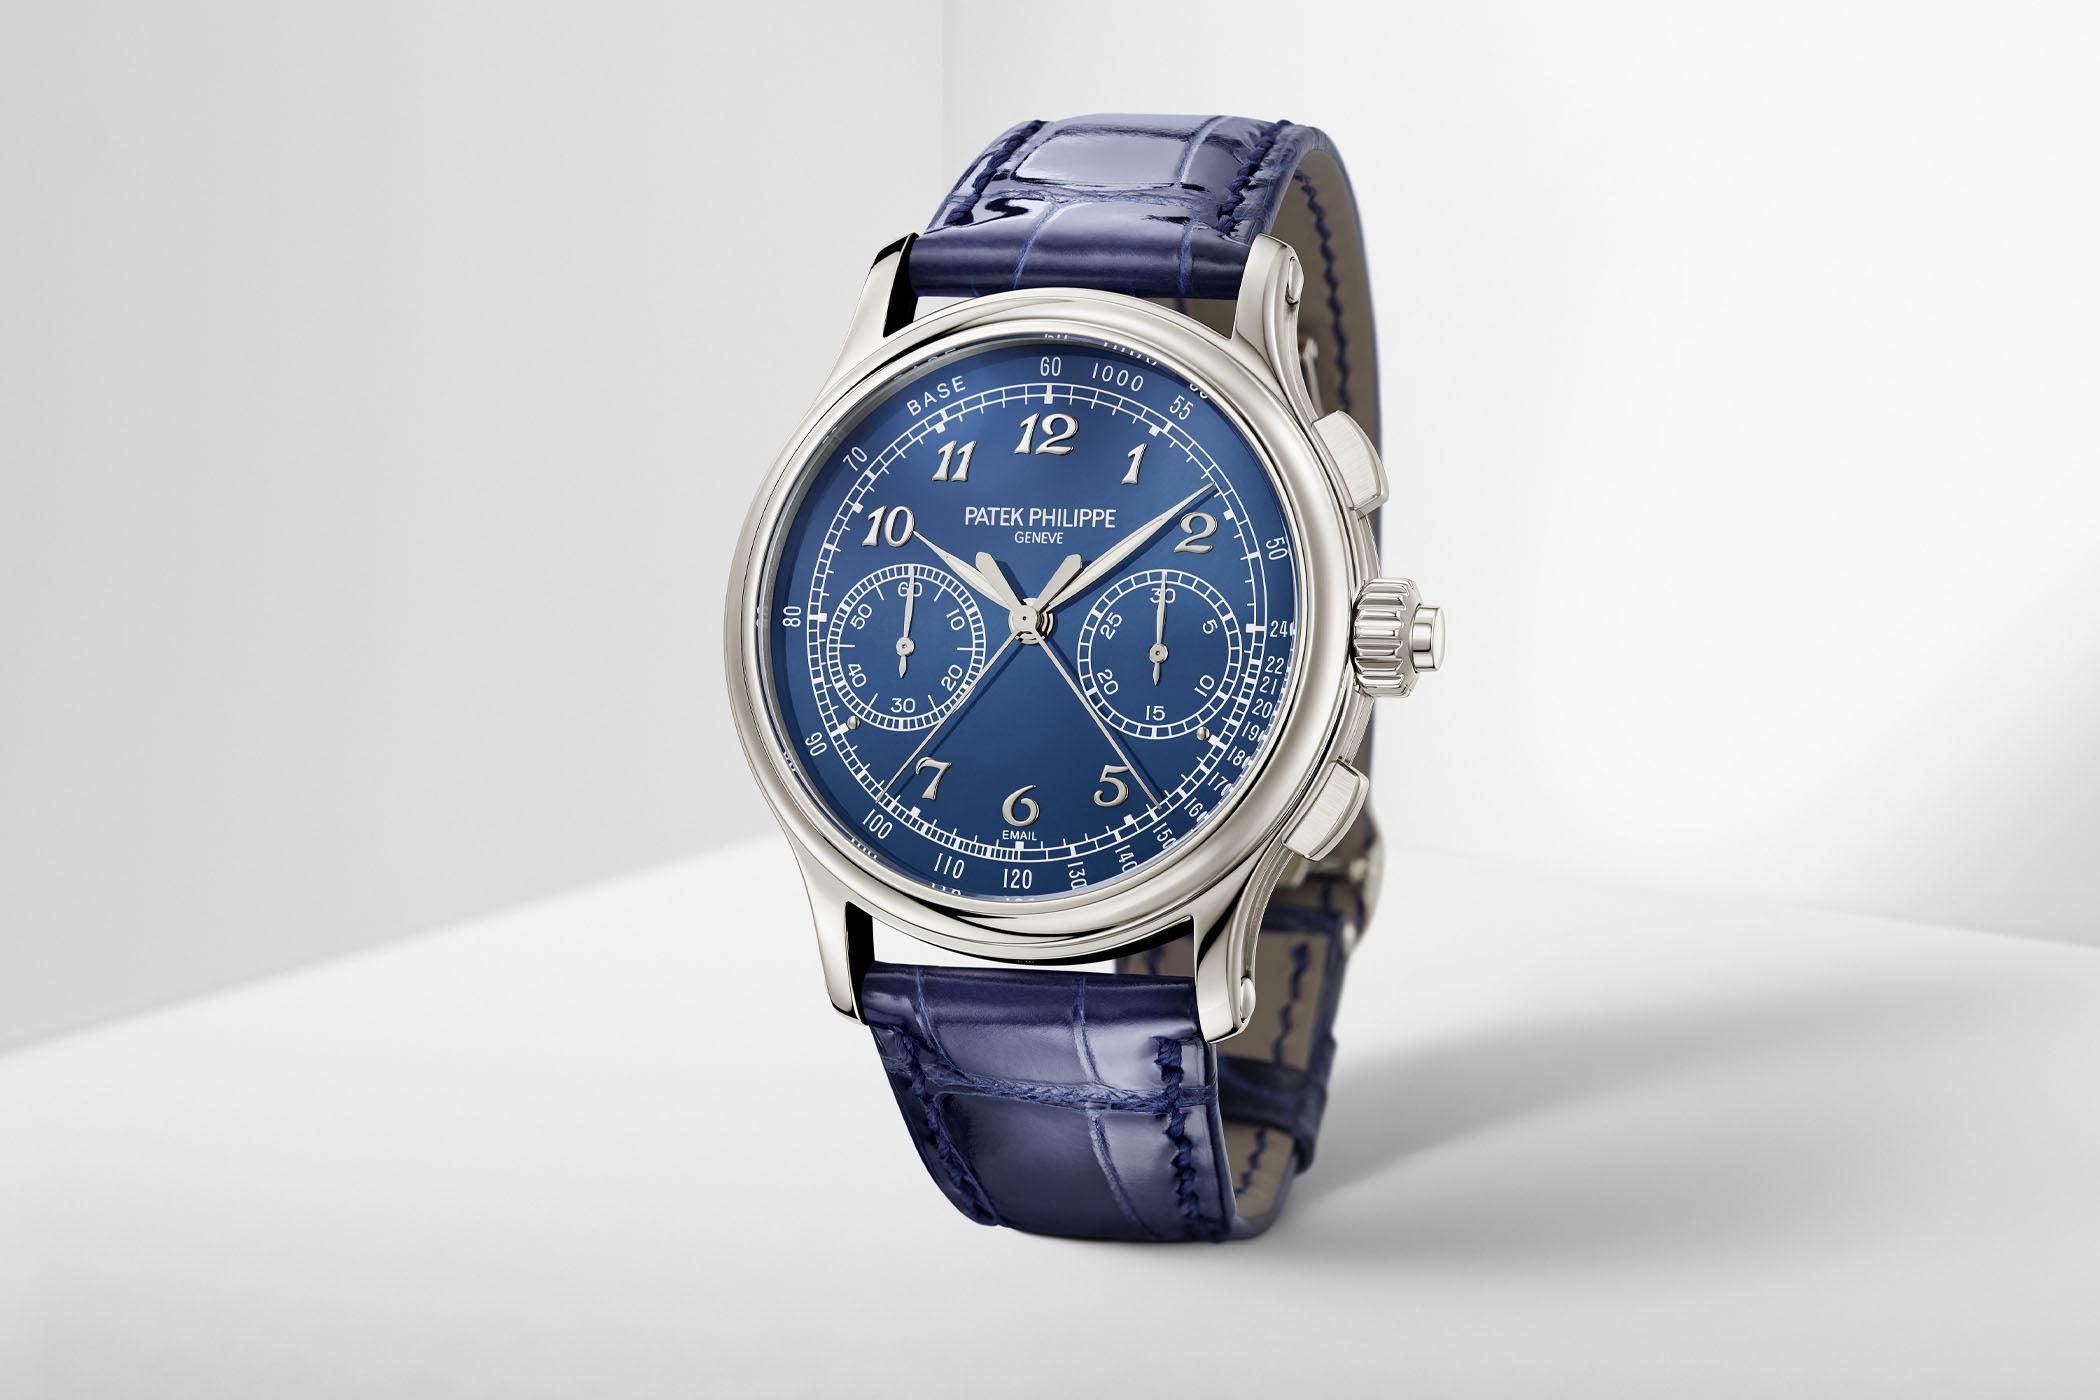 Patek Philippe NEW Ref. 5370P Split-Seconds Chronograph in platinum with blue Grand Feu enamel dial (2020)